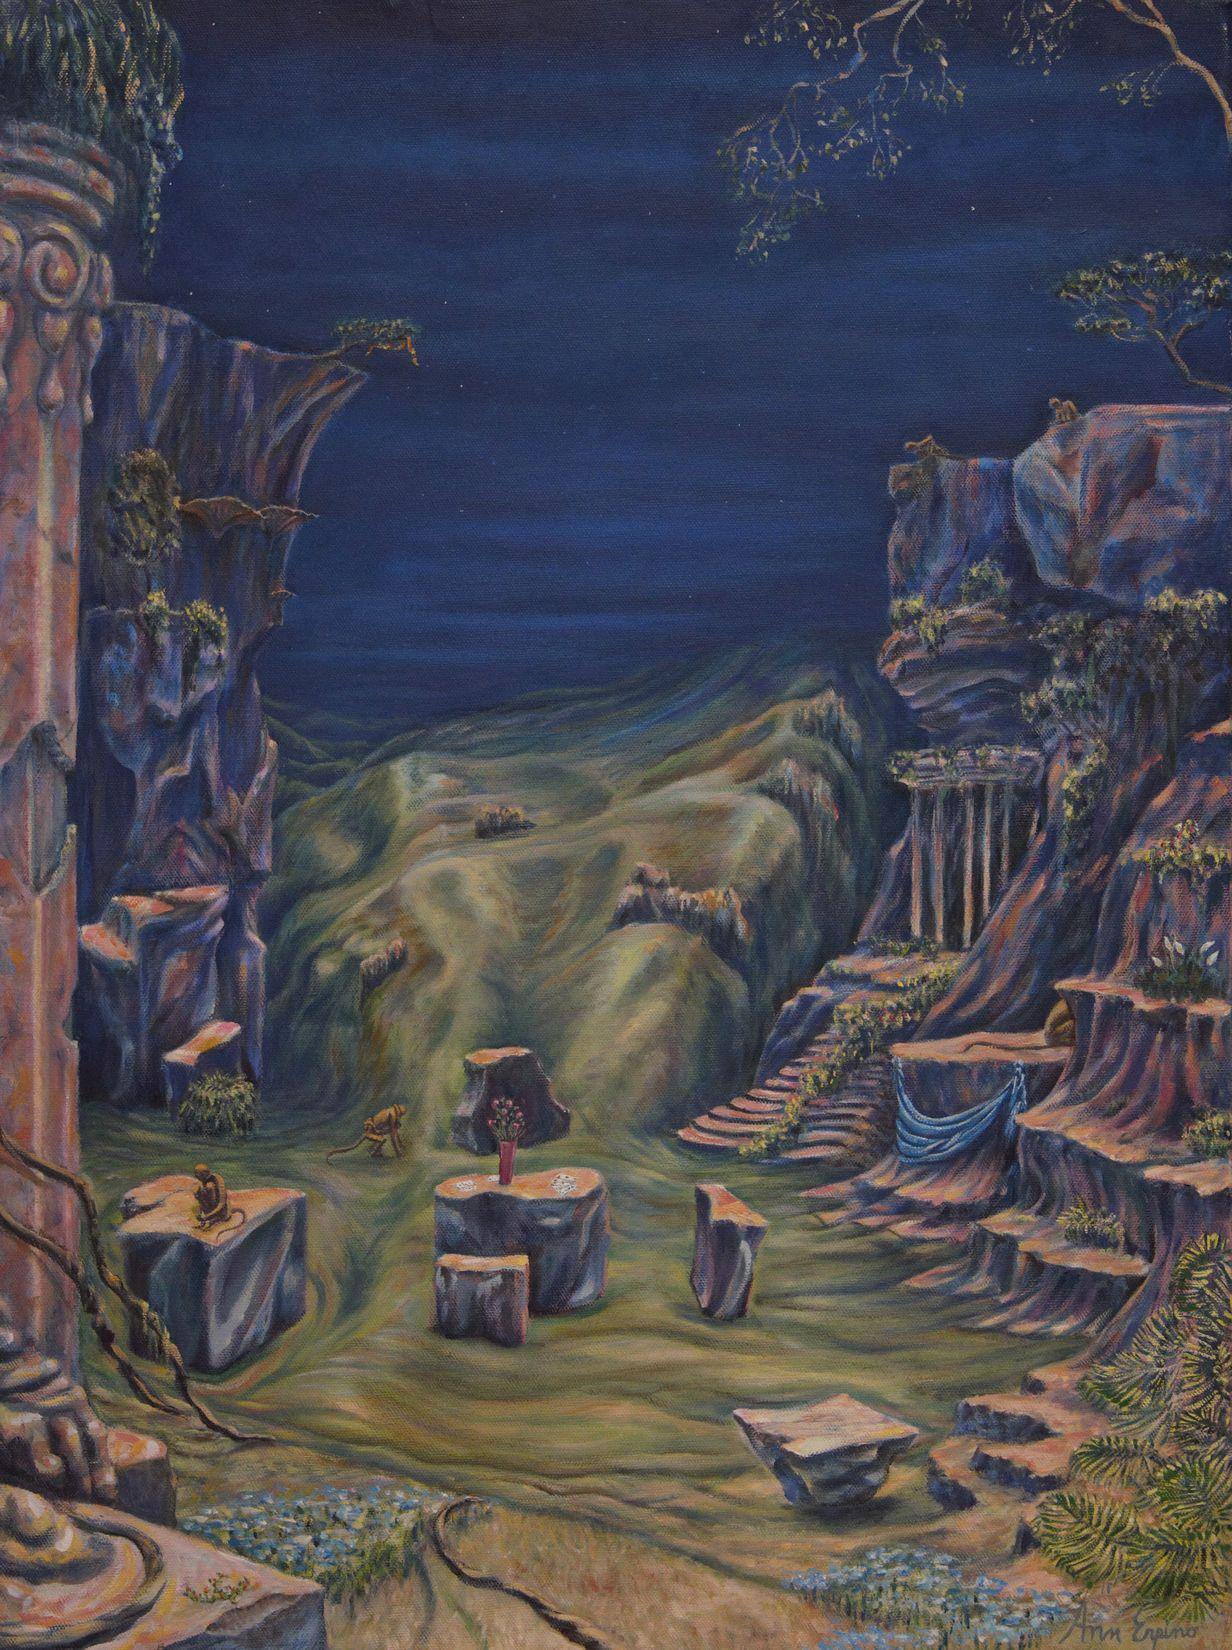 Monkey Temple at Midnight - oil on canvas, 24x18